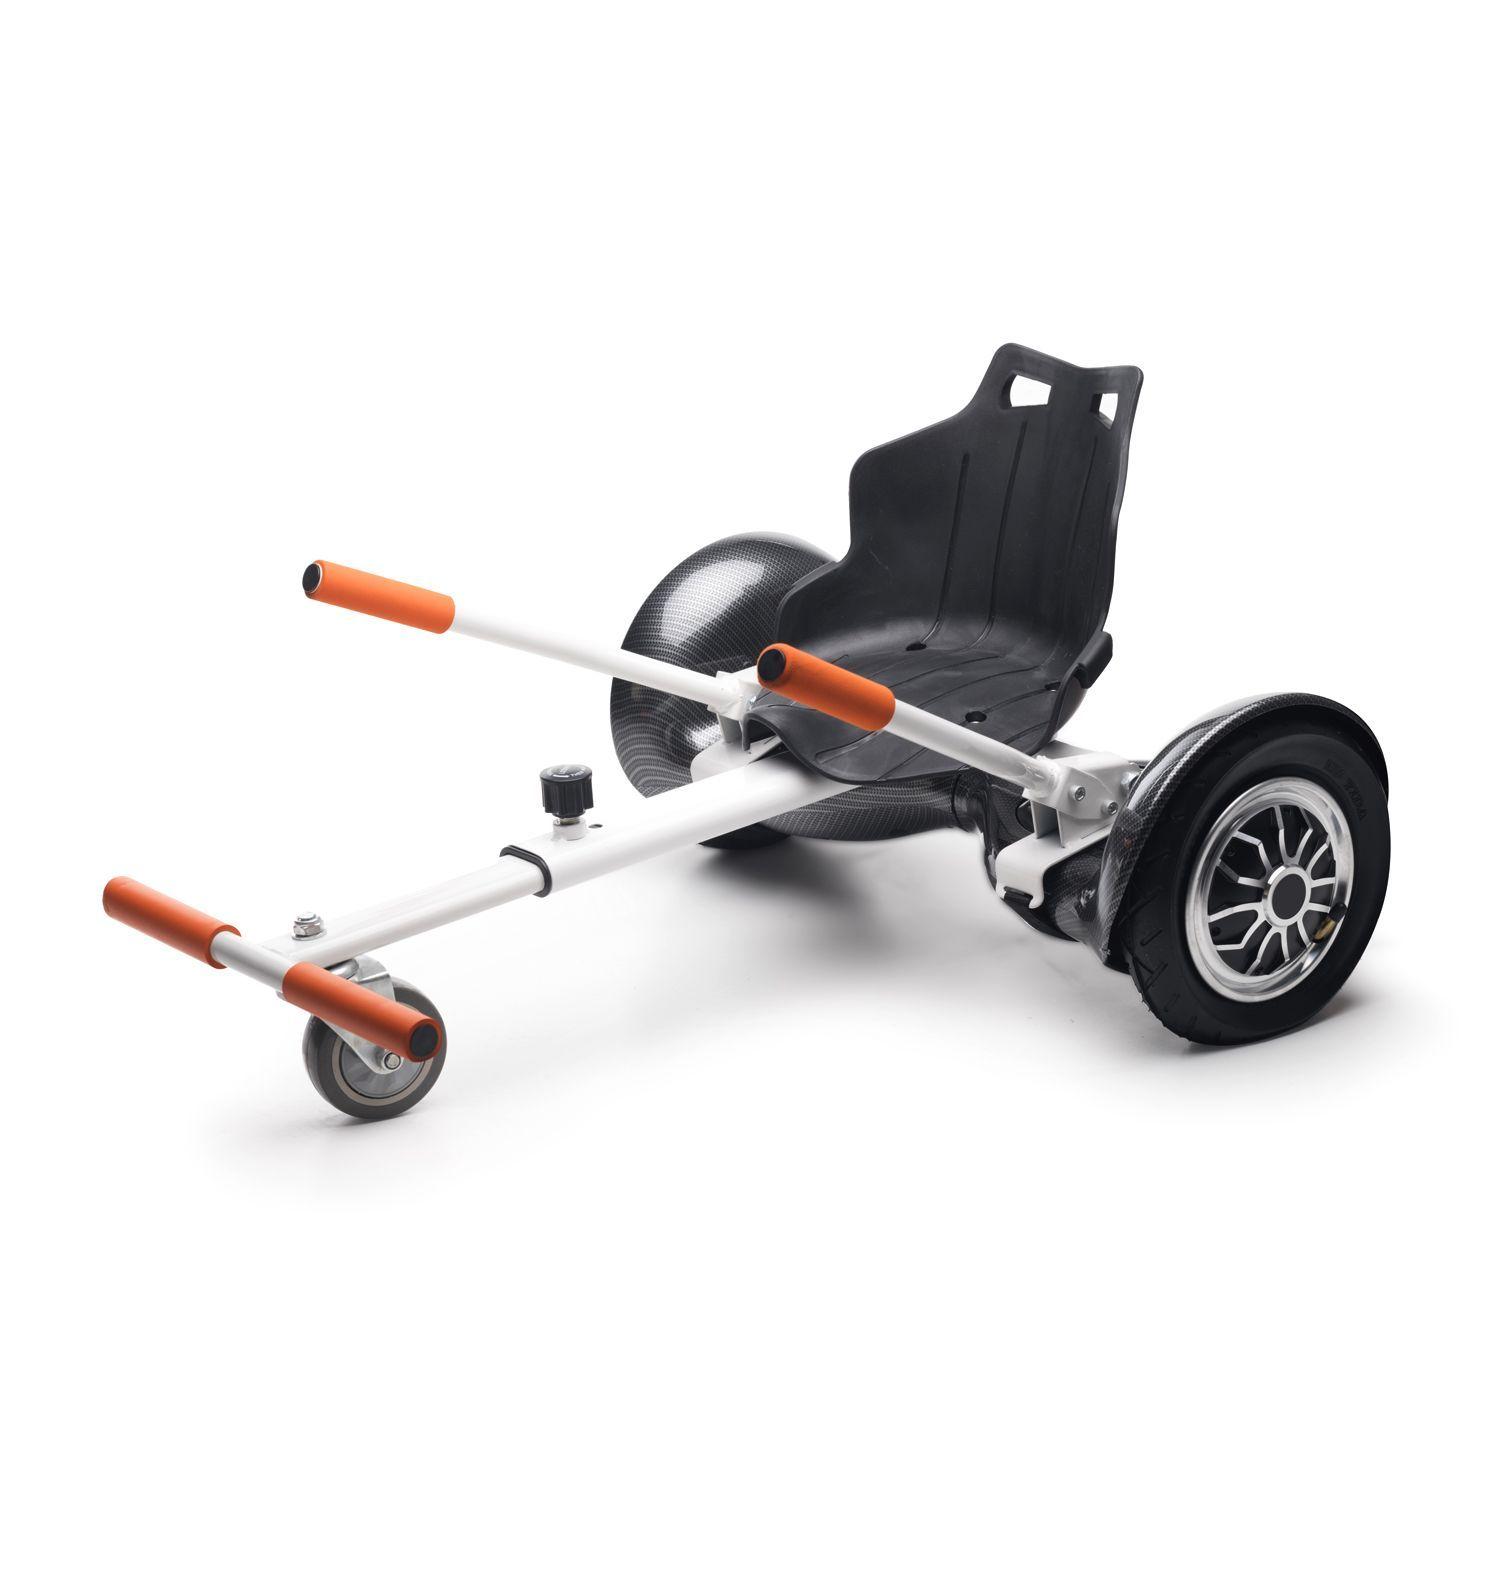 Zeeclo H3C + KC, KIT Hoverboard 10 ''convertisseur Carbono + Kart, haut-parleur, Altavoz, LEDS, Infantil, Adultos, Morado